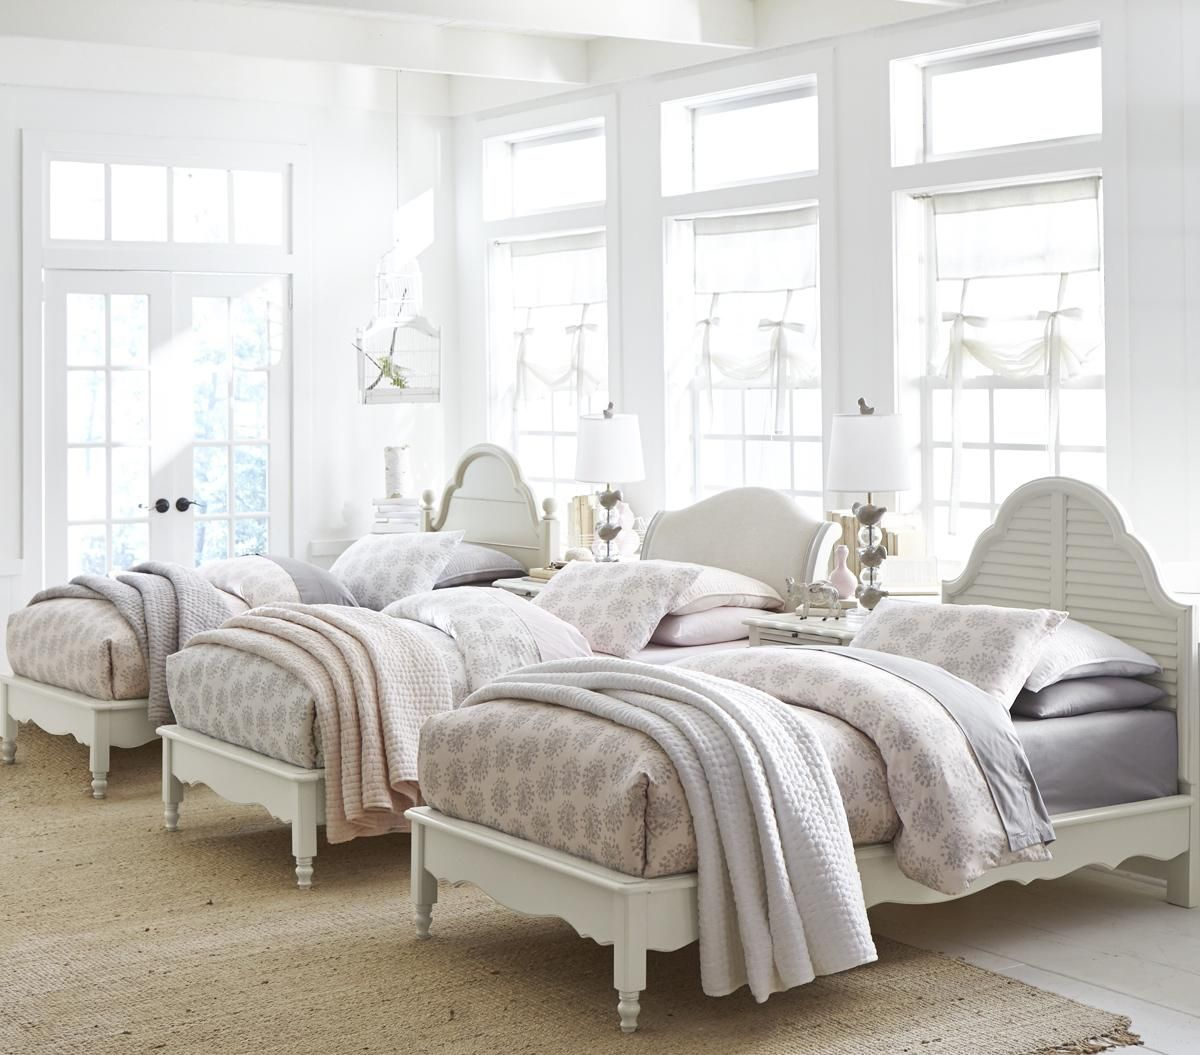 Beautiful Bedroom For A Room For Multiple Children. #cottage #bedroom